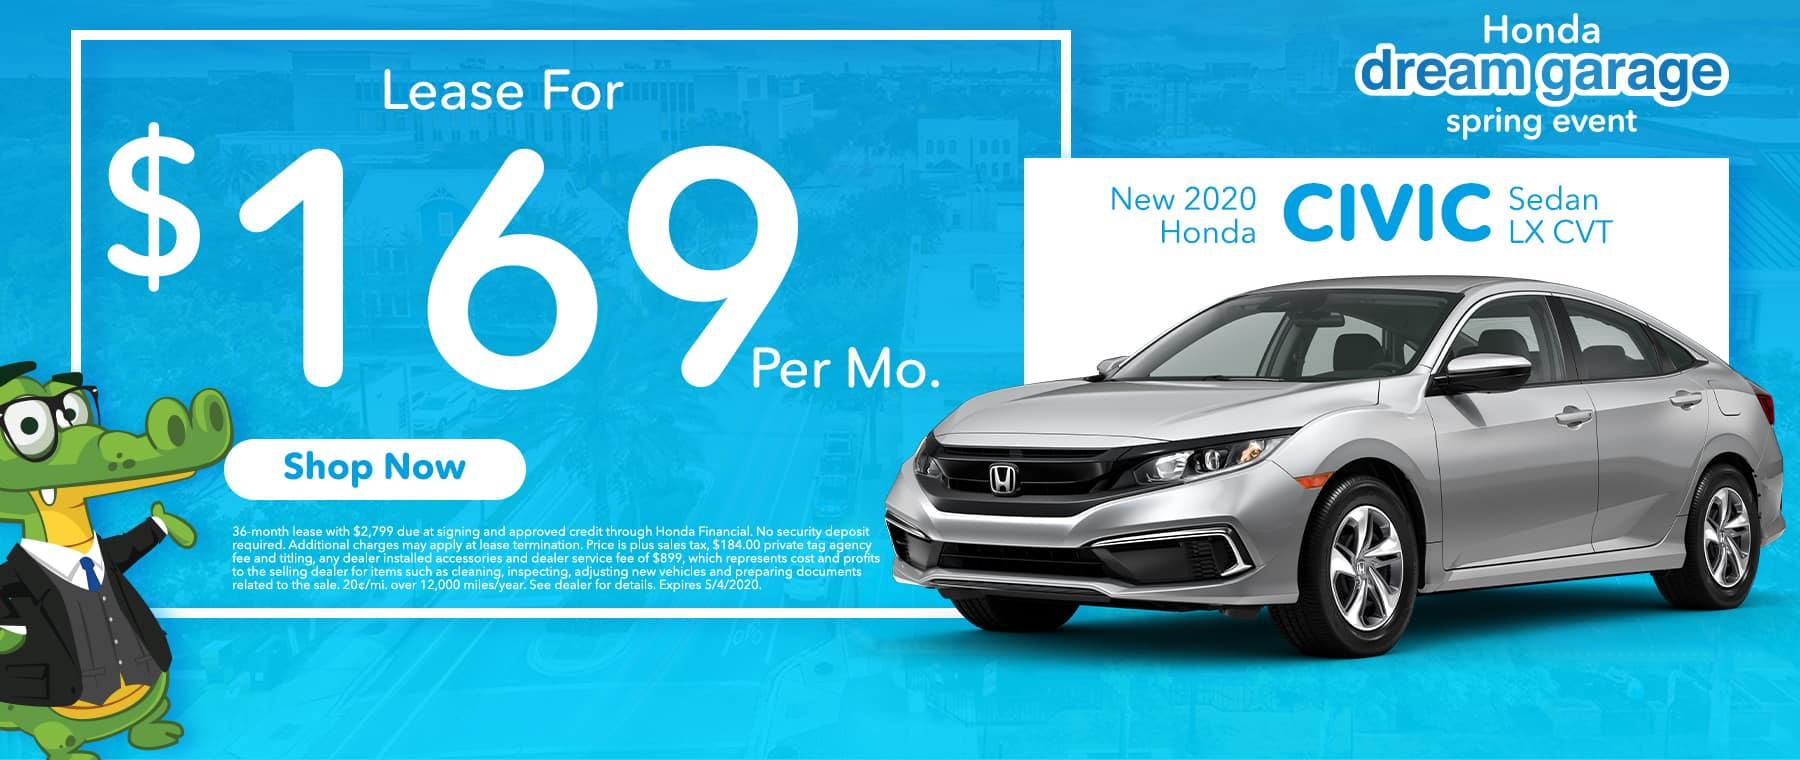 New 2020 Honda Civic Sedan LX CVT | Lease For $169 Per Mo | Honda Dream Garage Spring Event